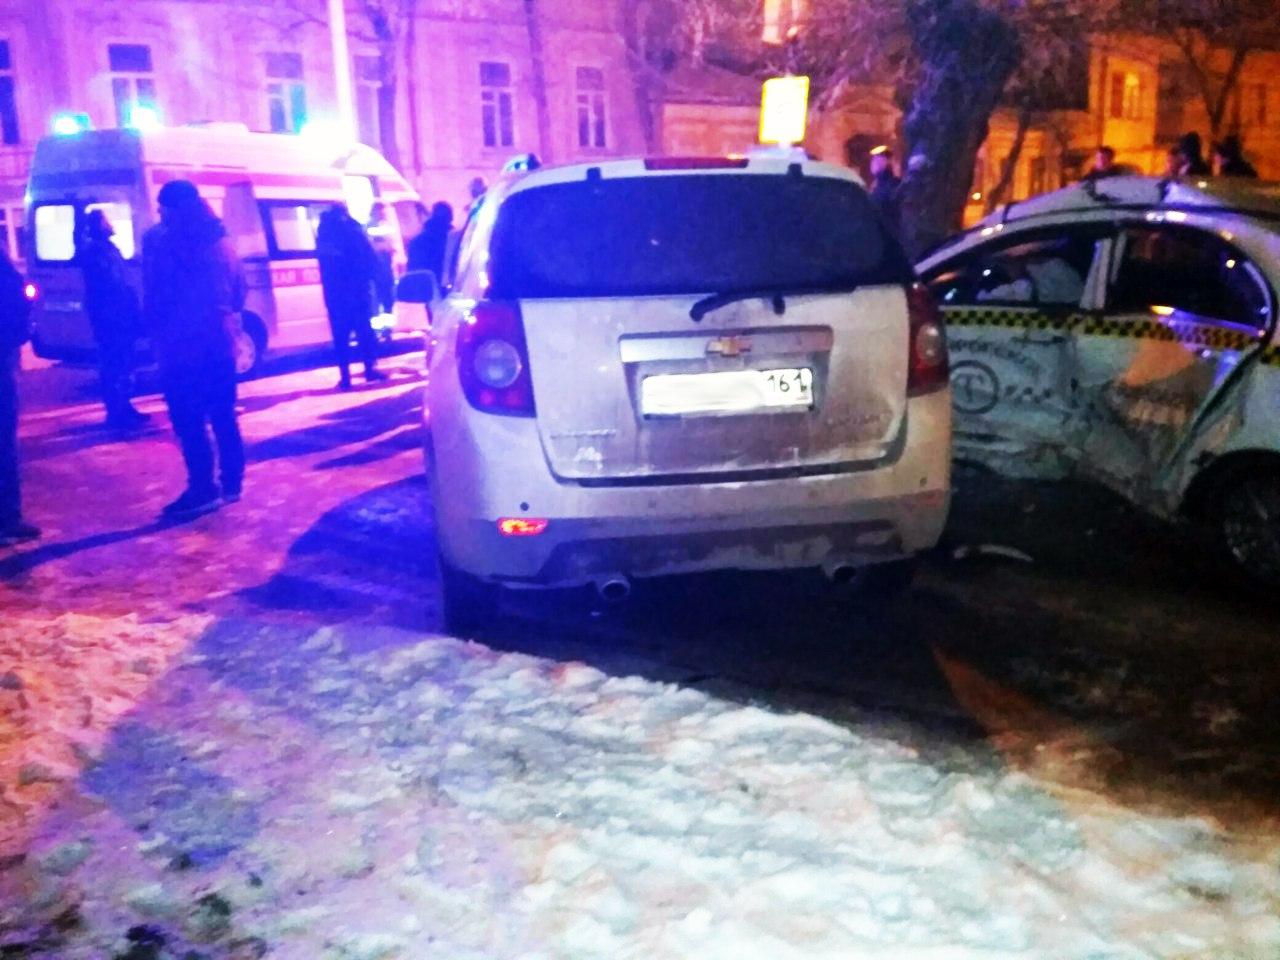 В центре Таганрога молодежь на Chevrolet Captiva «впечатала» таксиста на Geely Emgrand в дерево и столб